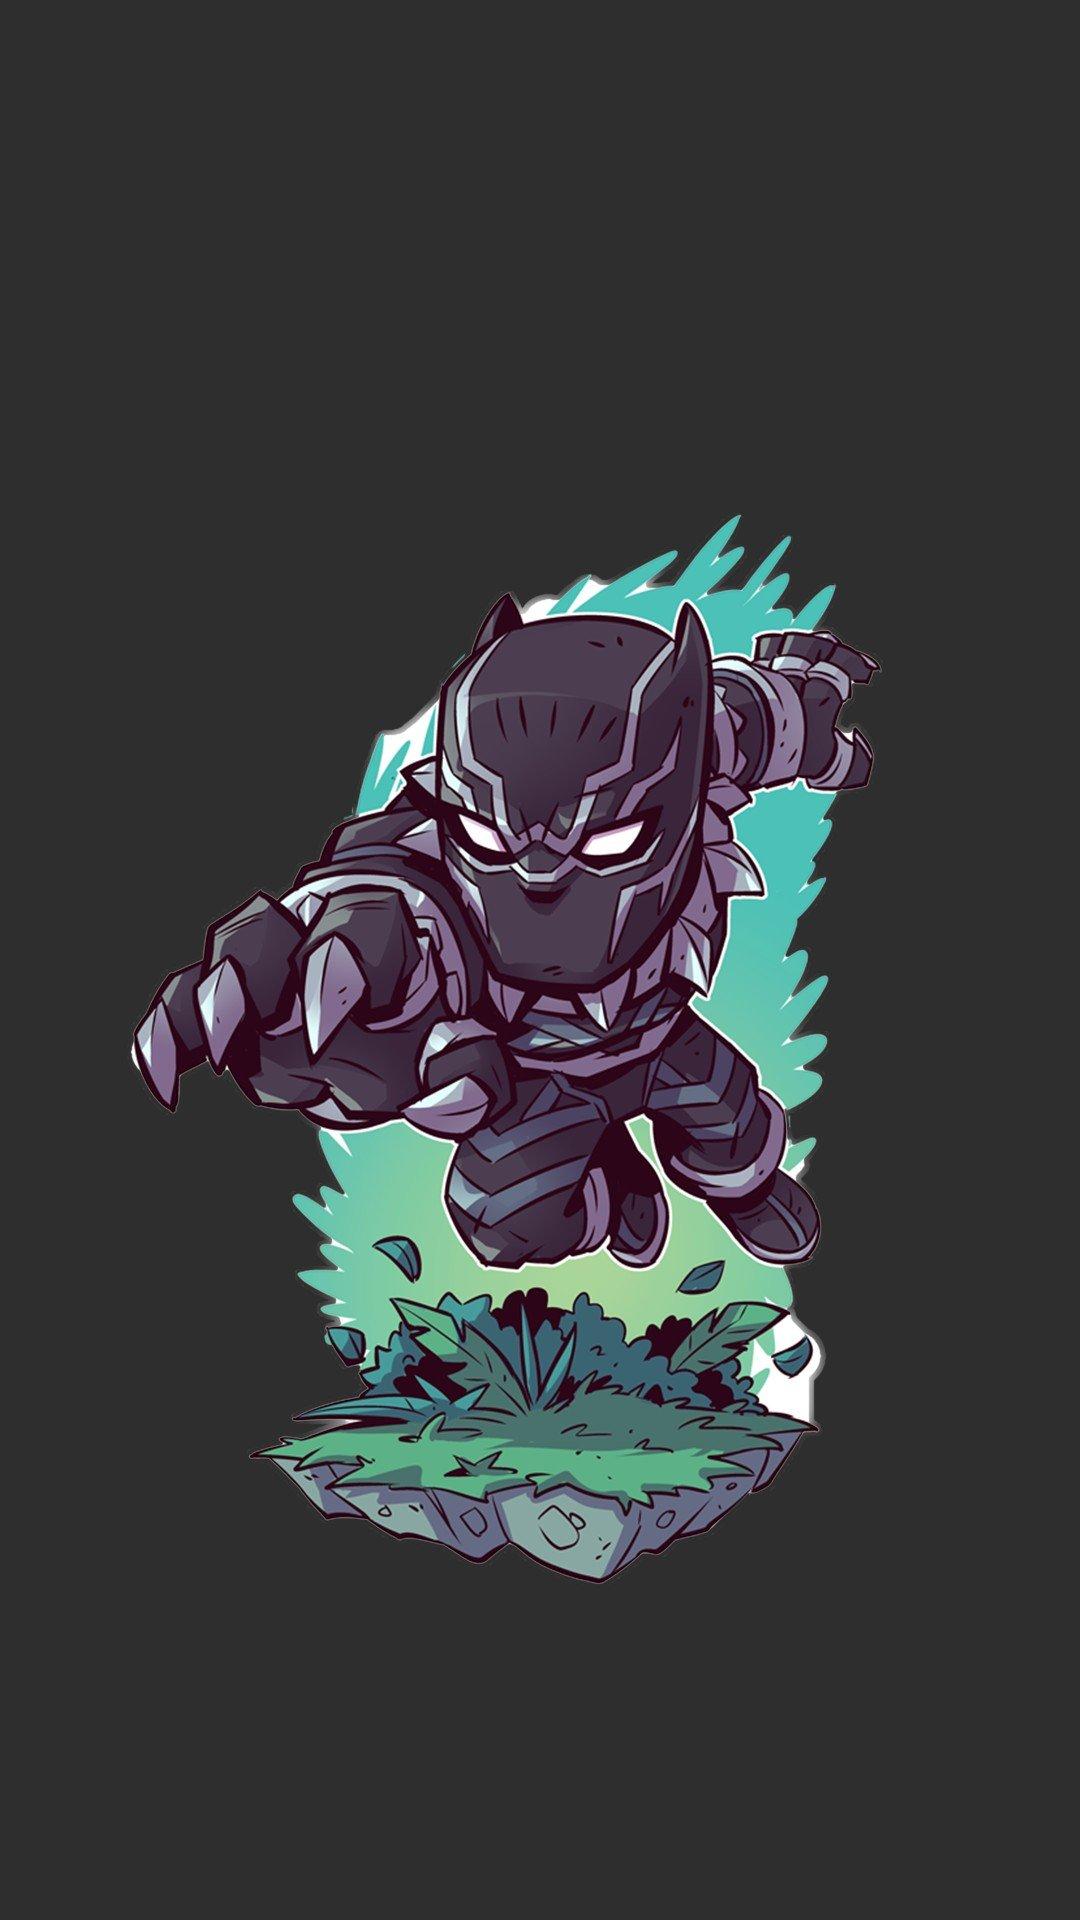 Doctor Symbol Hd Wallpaper Black Panther Superhero Marvel Comics Hd Wallpapers